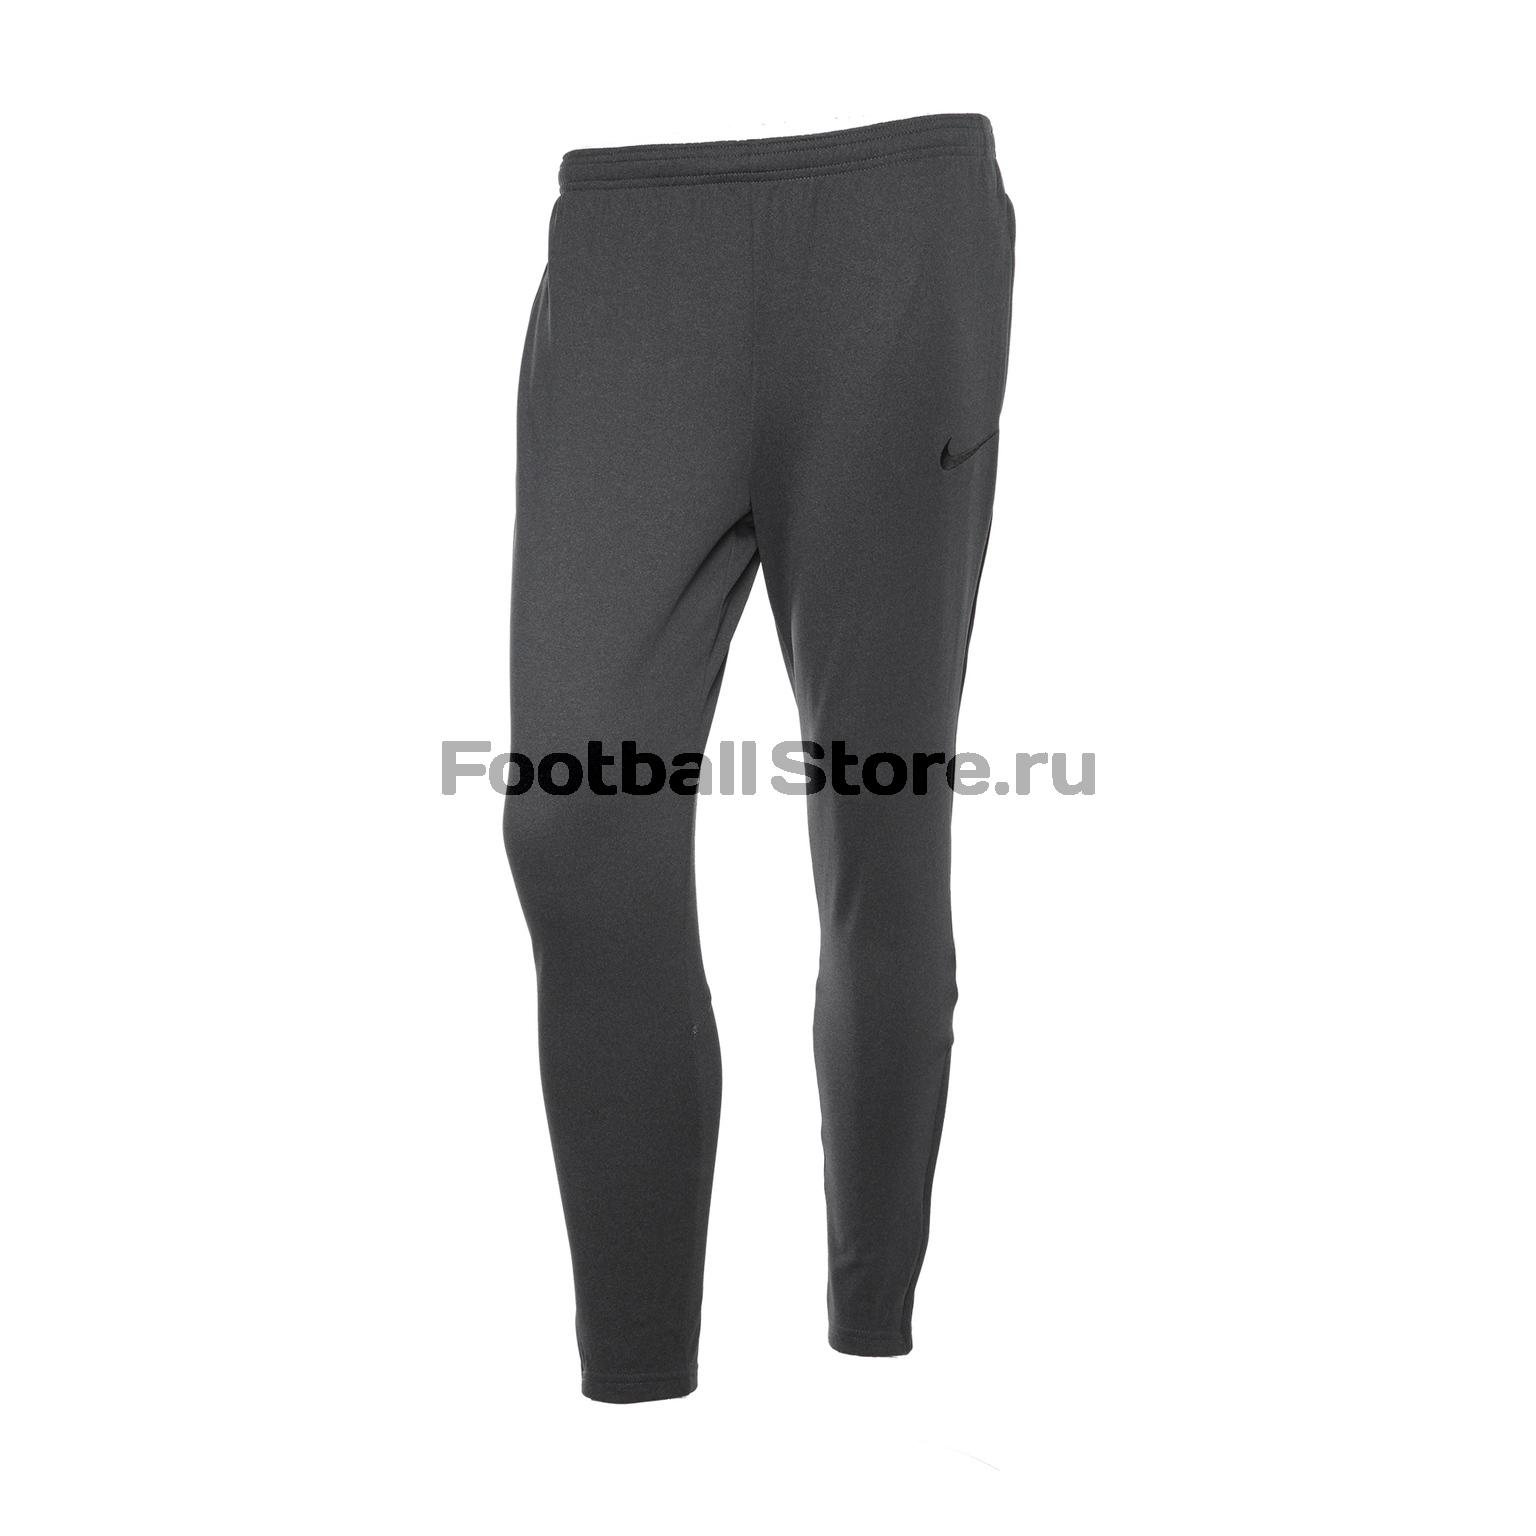 Брюки тренировочные Nike Dry Academy WTR AH3924-011 nike брюки тренировочные nike strike pnt wp wz 688393 011